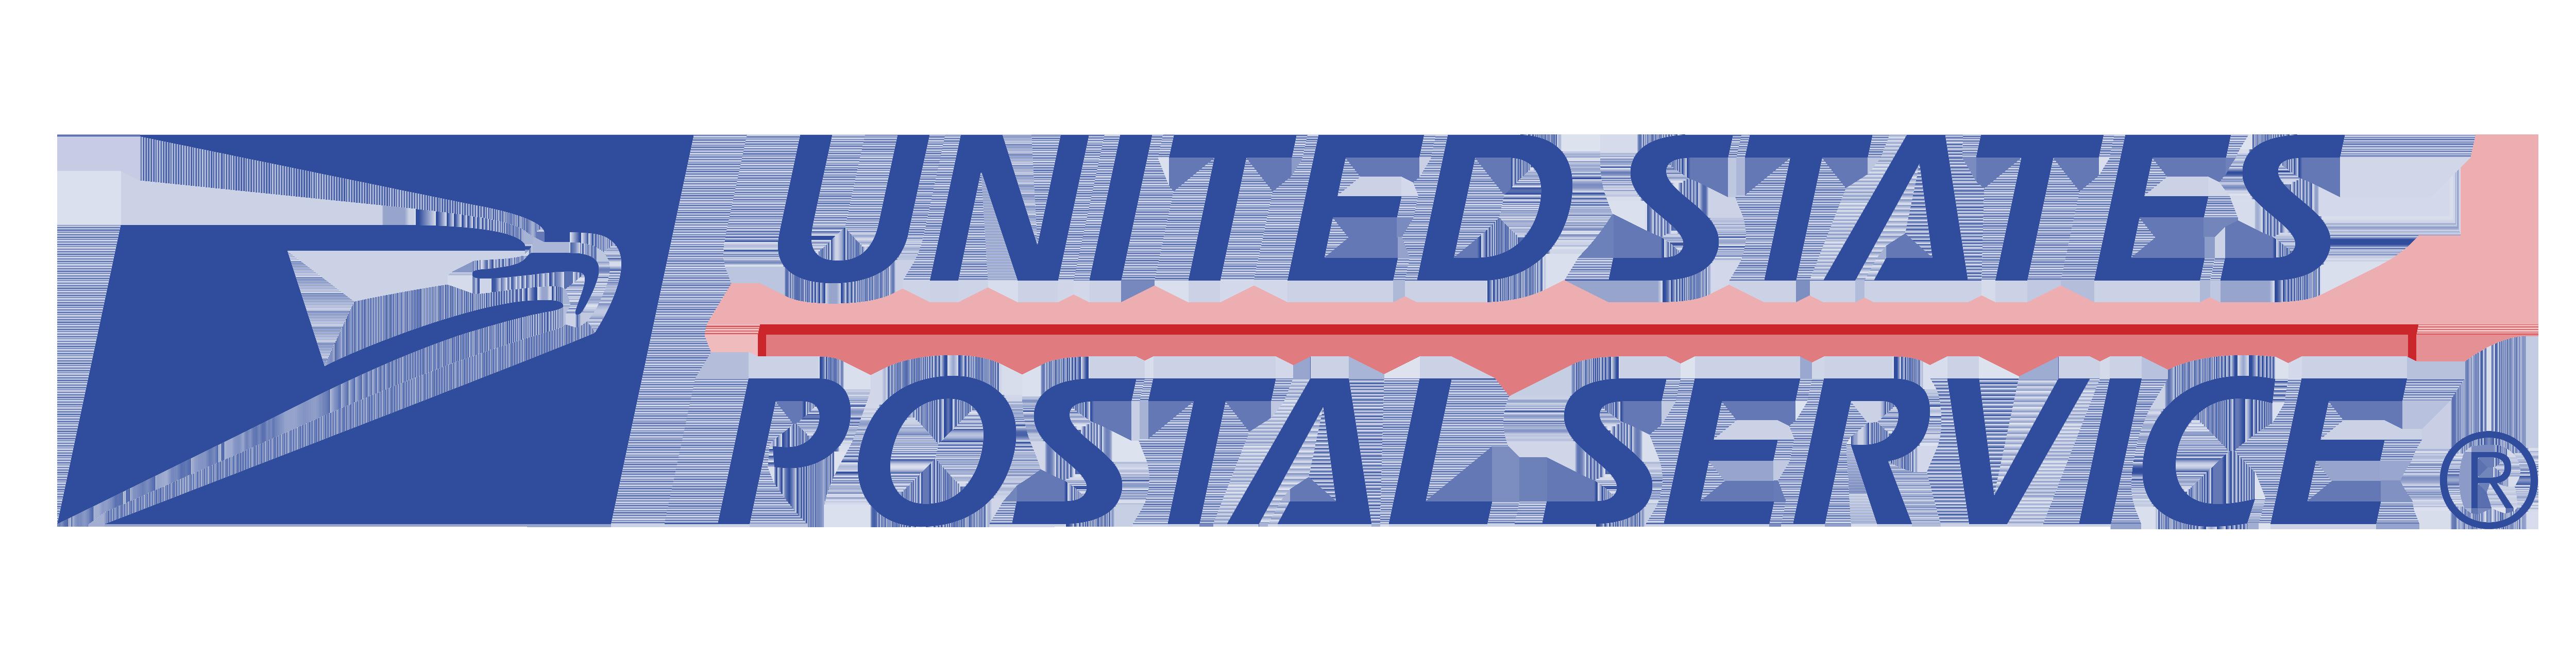 United_States_Postal_Service_logo